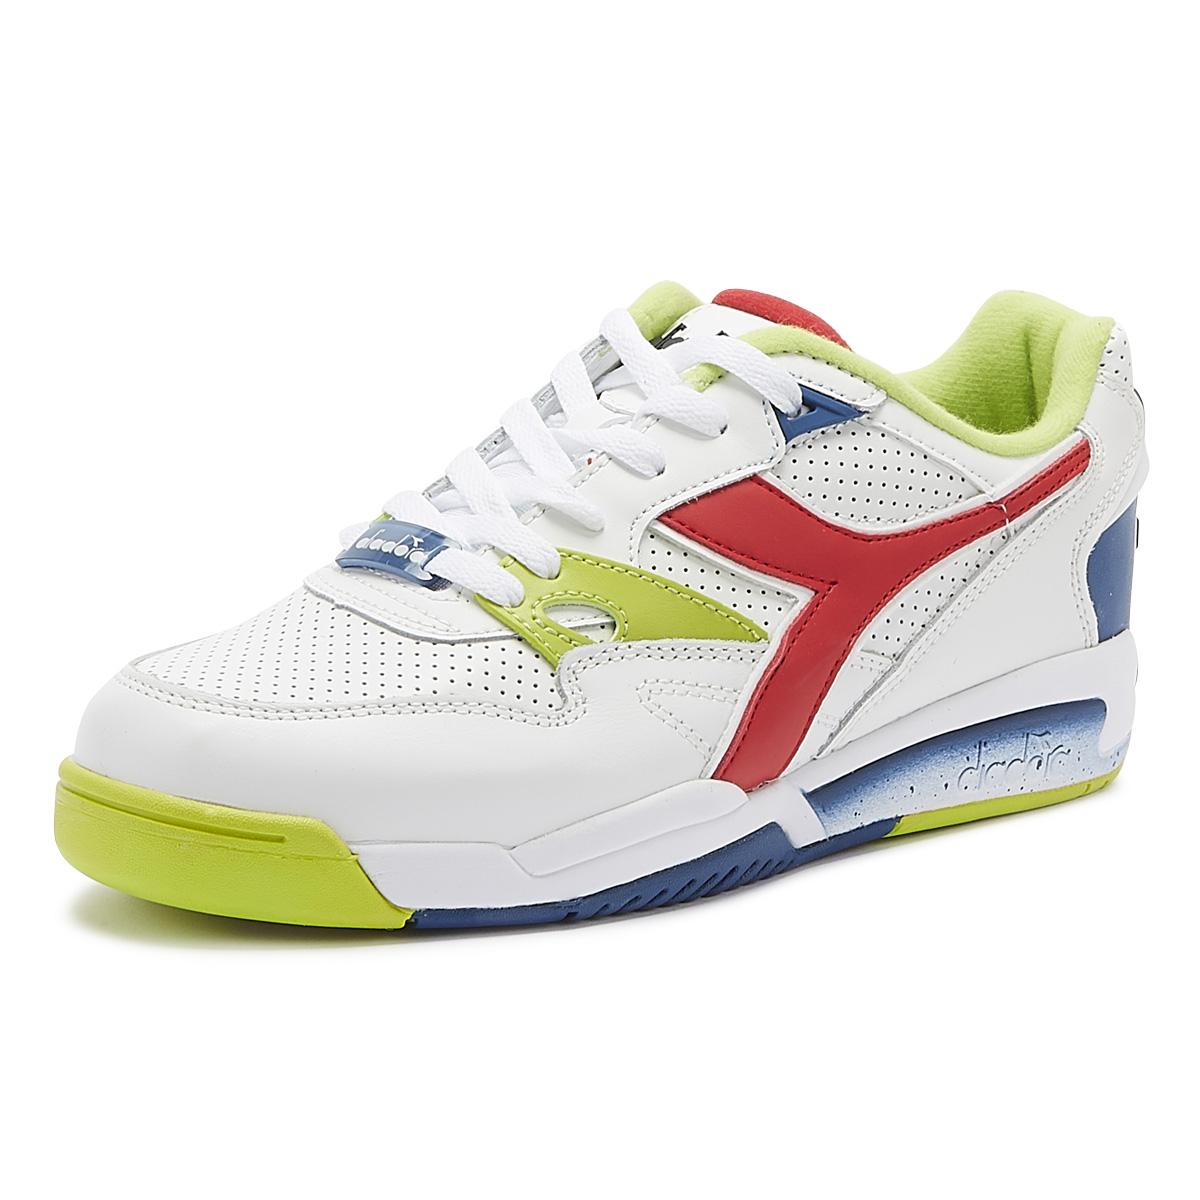 2020 Diadora Rebound Ace Uomini Bianco Leather Trainers